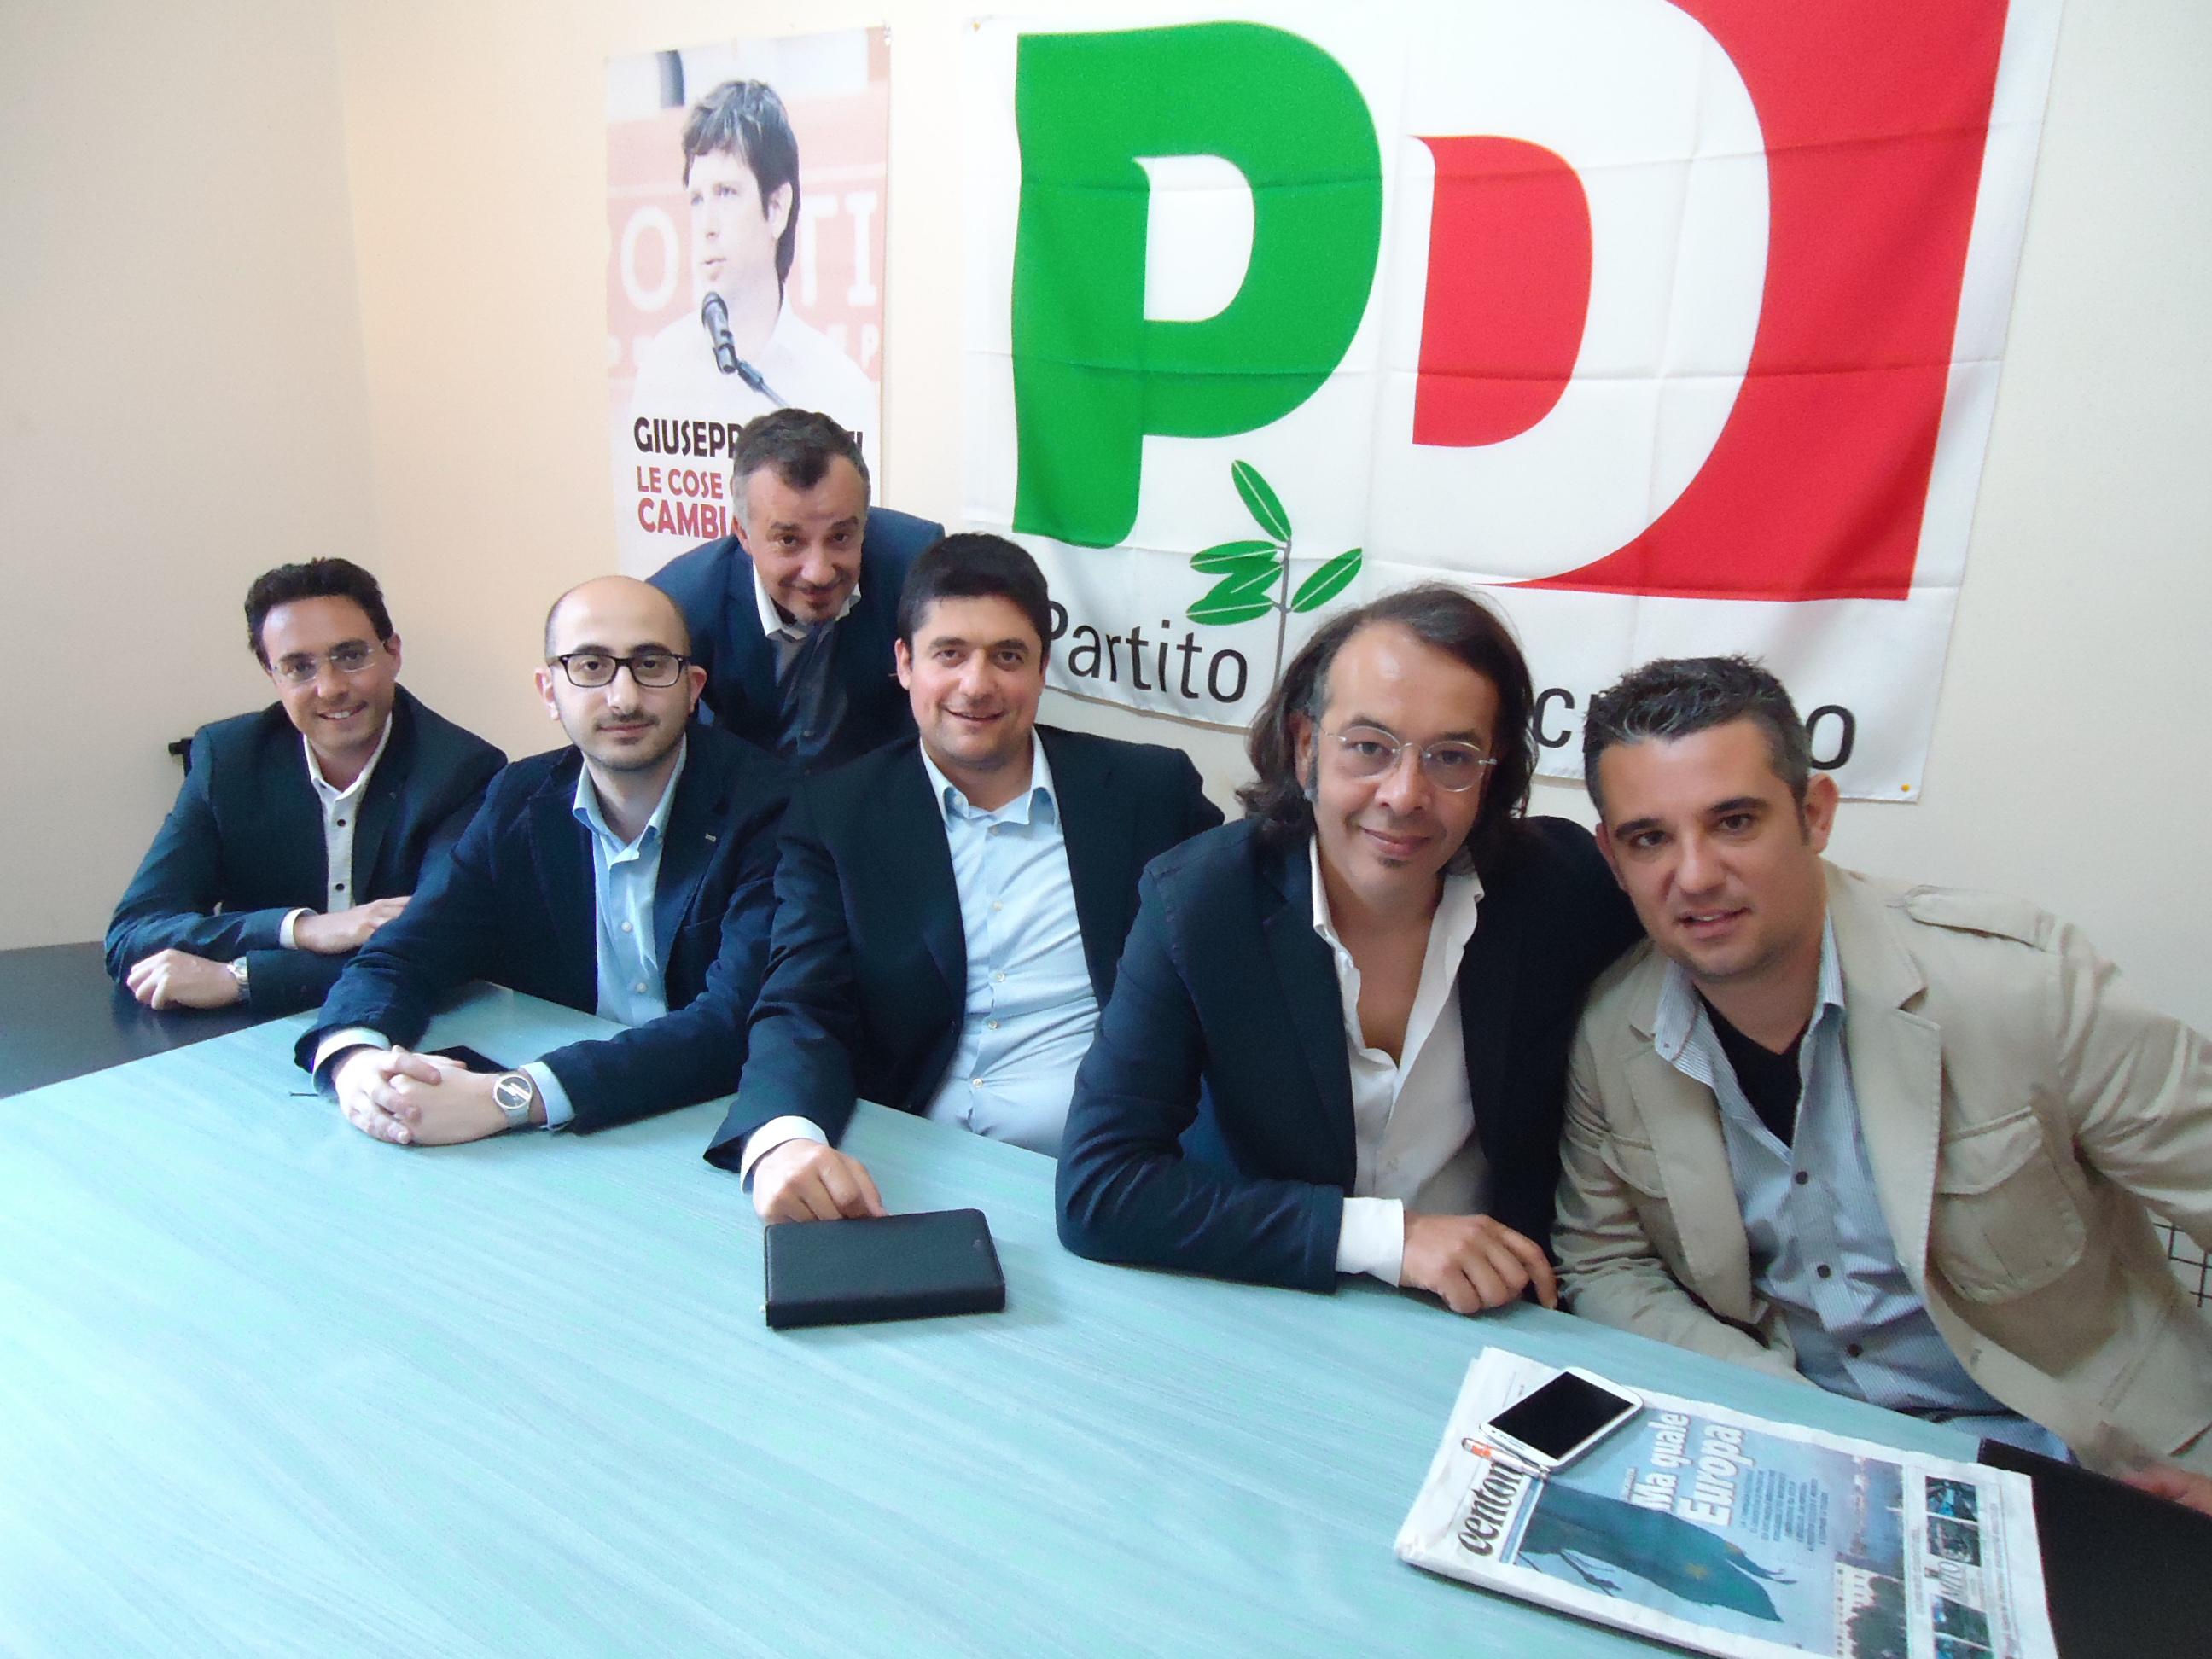 comitato-Area-Civati_Pintaudo_Foti_David_De-Francesco_Di-Cesare_Visalli_quimessina